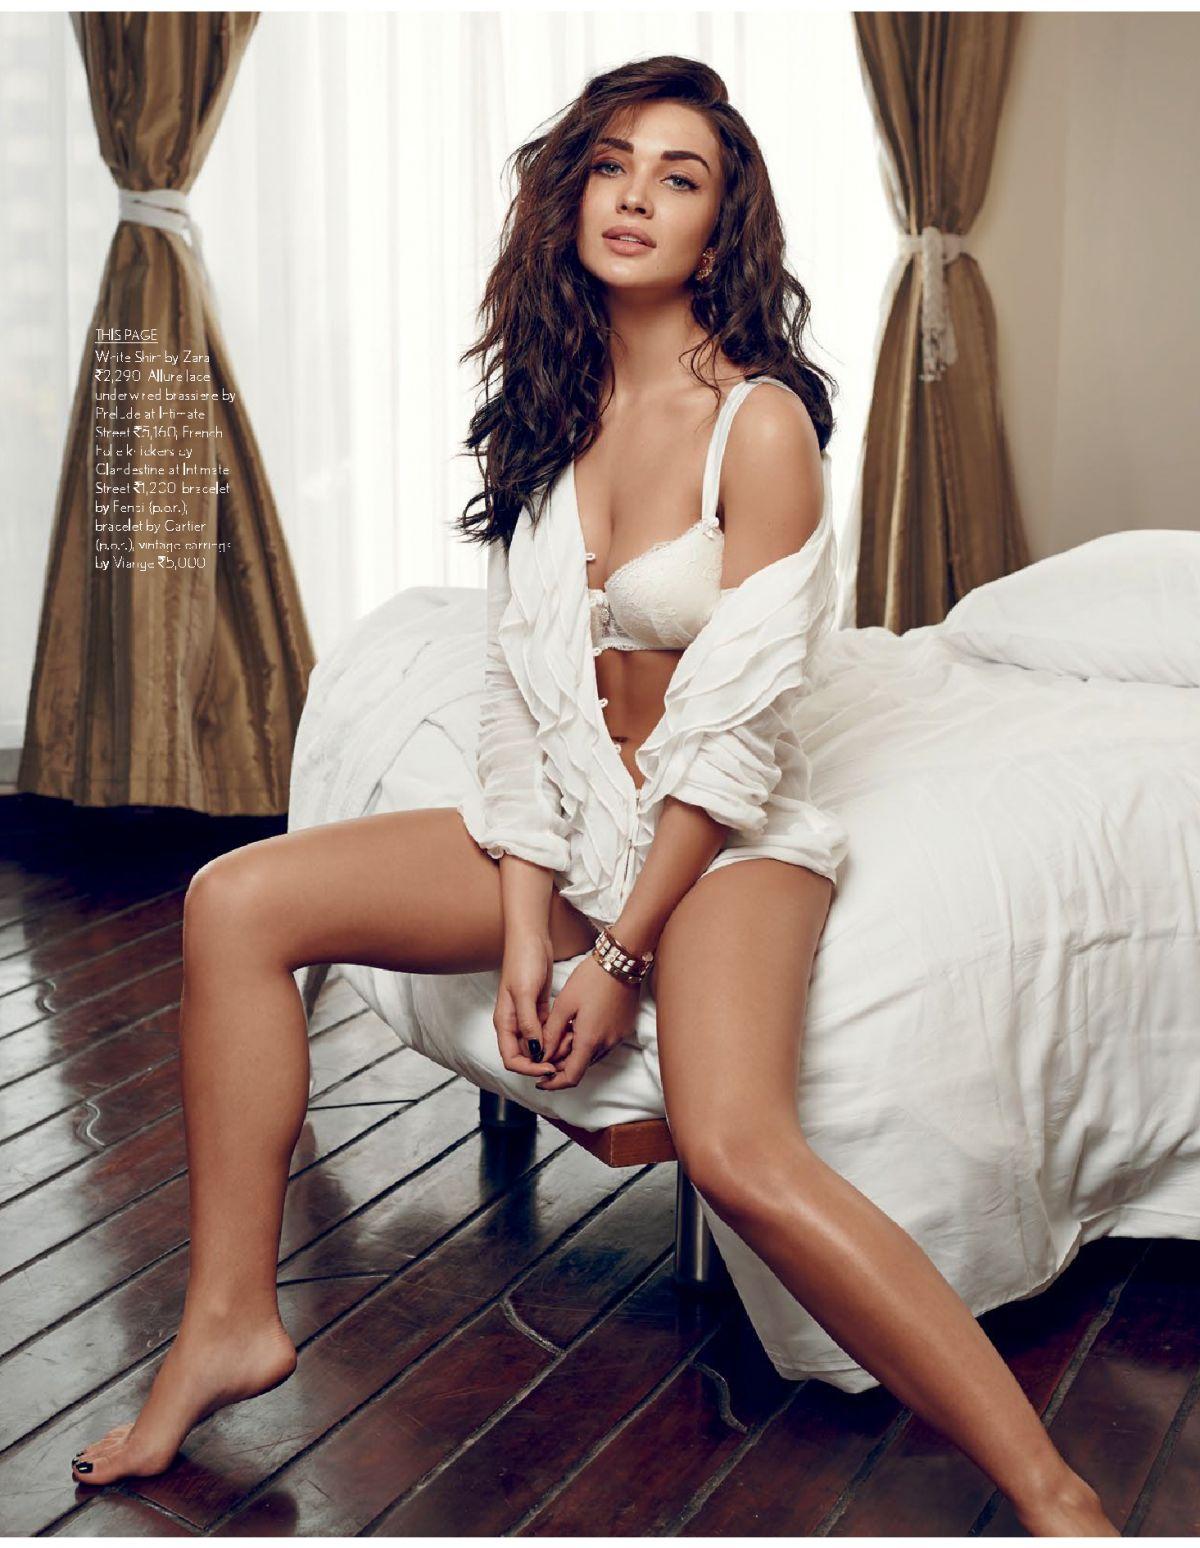 Amy jackson nude bikini santabanta forums